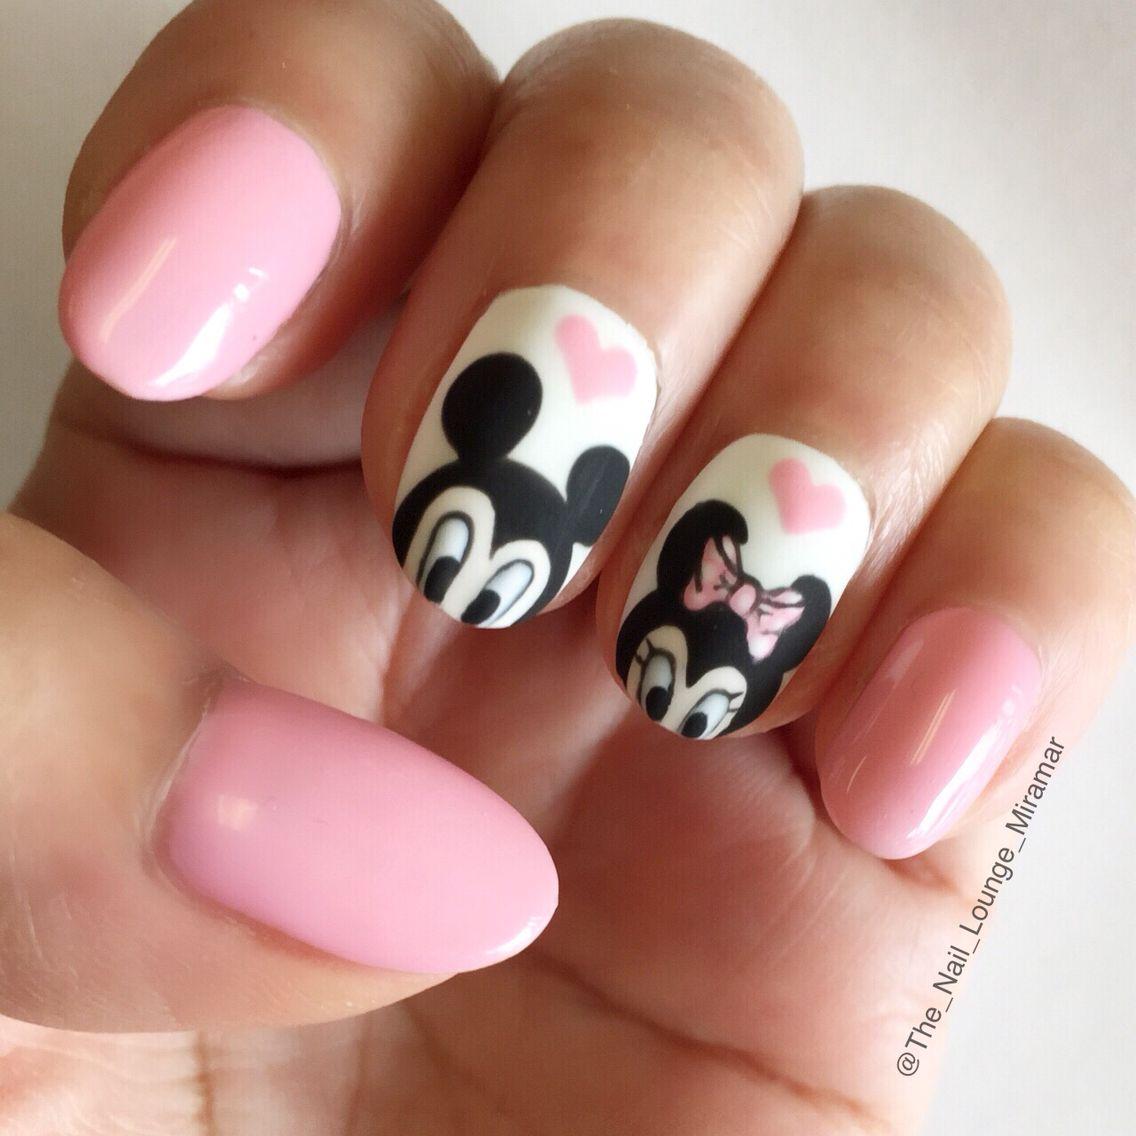 Disney Mickey Minnie Mouse nail art design | Nail Art | Pinterest ...